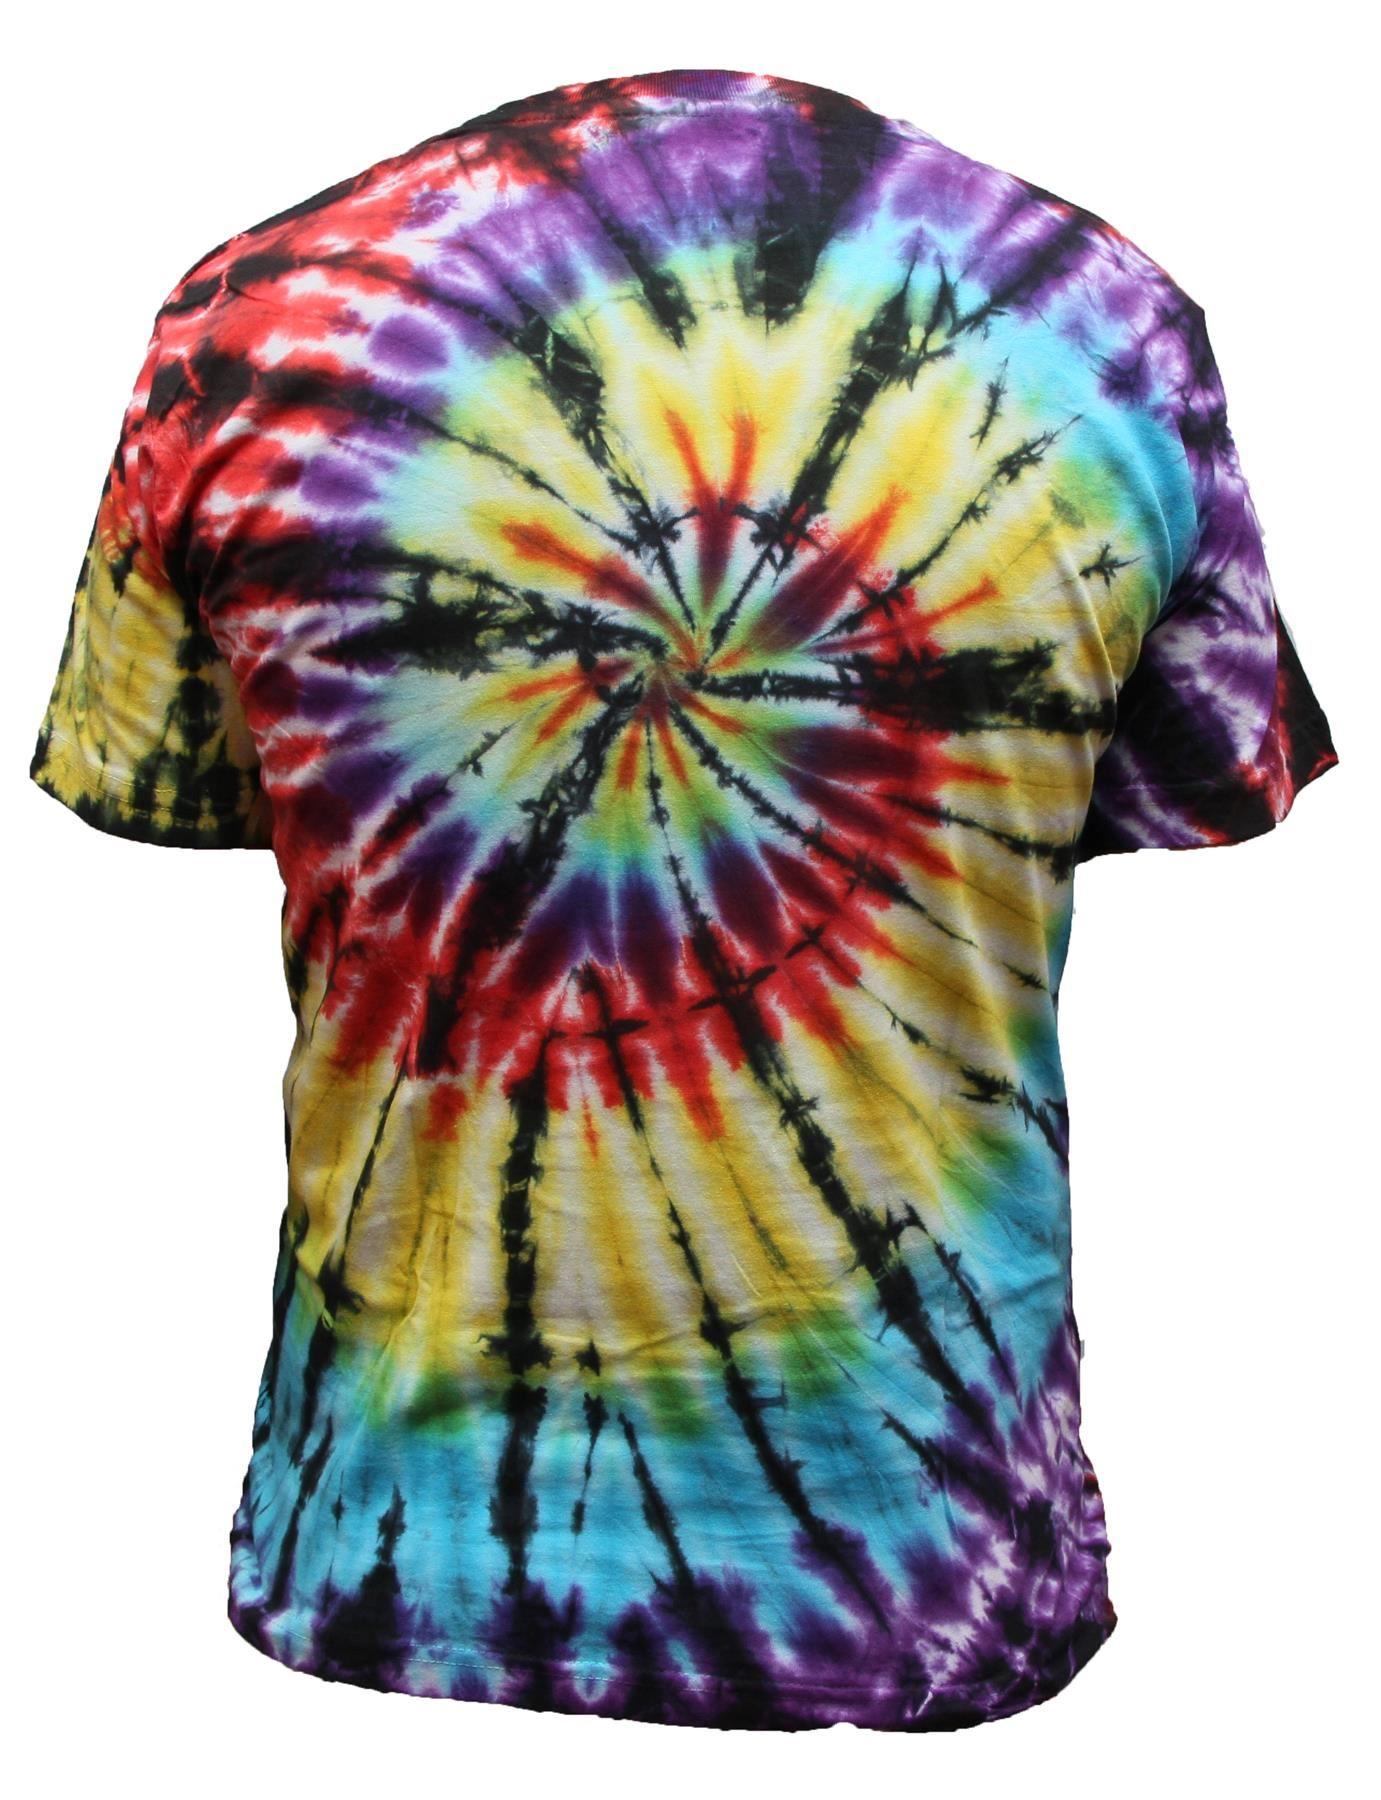 Tie-Dye-T-Shirt-Music-Festival-Tye-Dye-Tee-Hipster-Retro-Unisex-Short-Sleeve-Top thumbnail 9